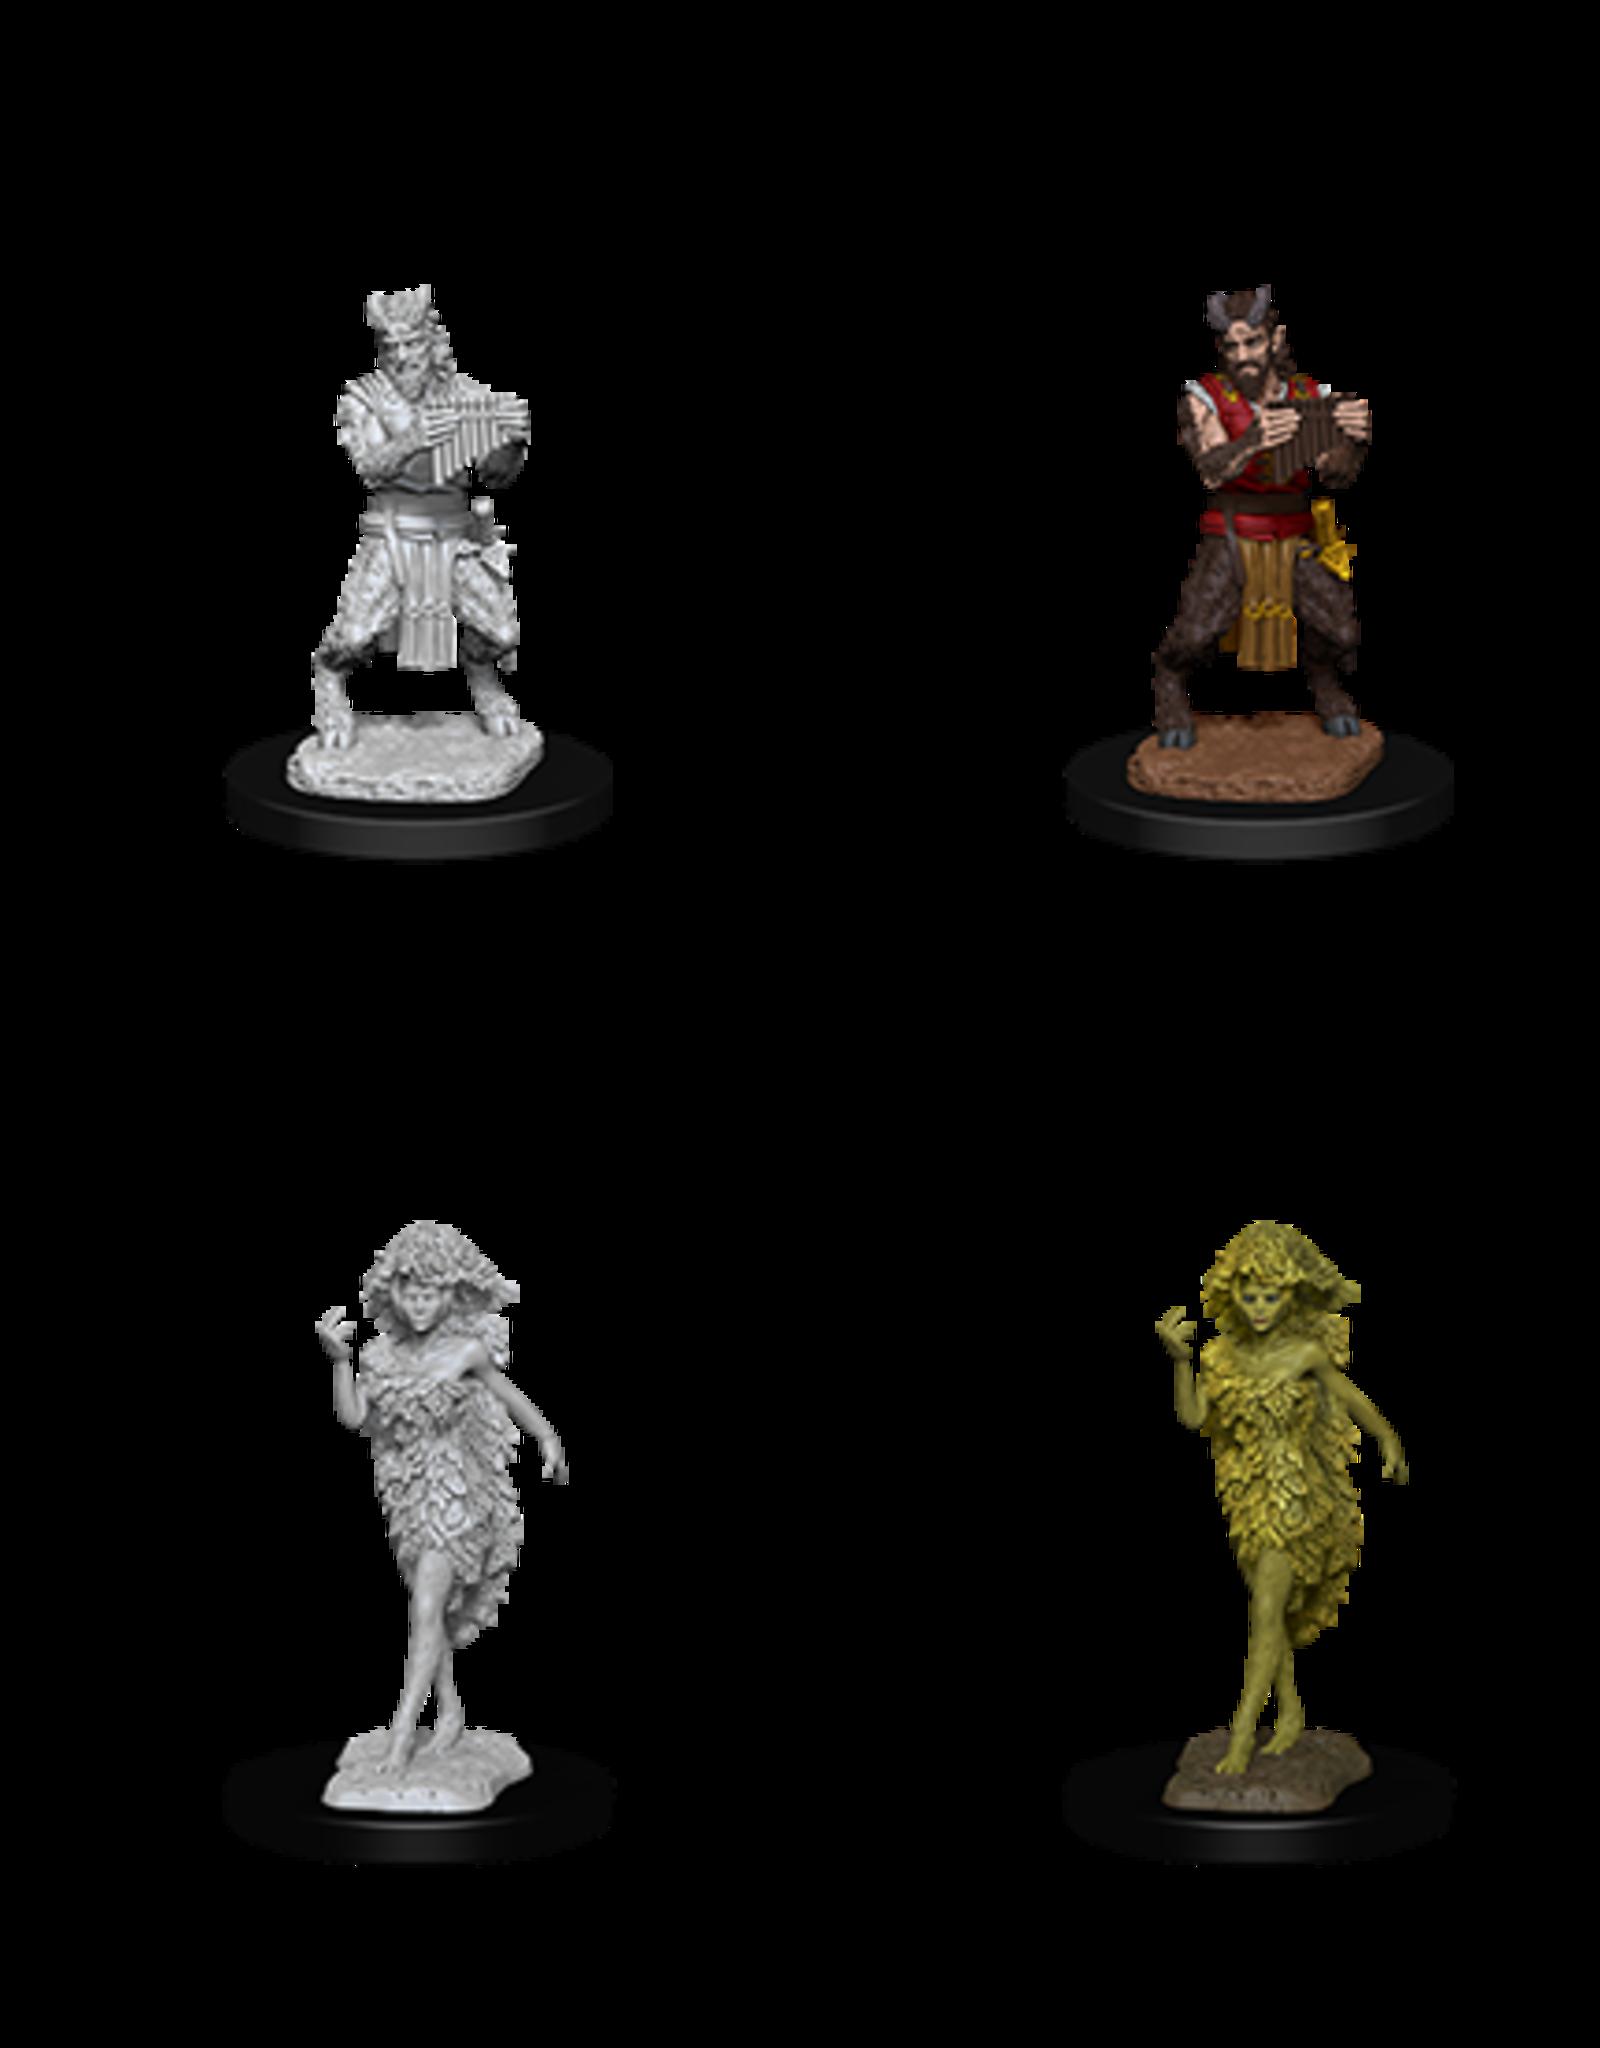 Nolzur's Marvelous Miniatures D&D NMU: Satyr & Dryad